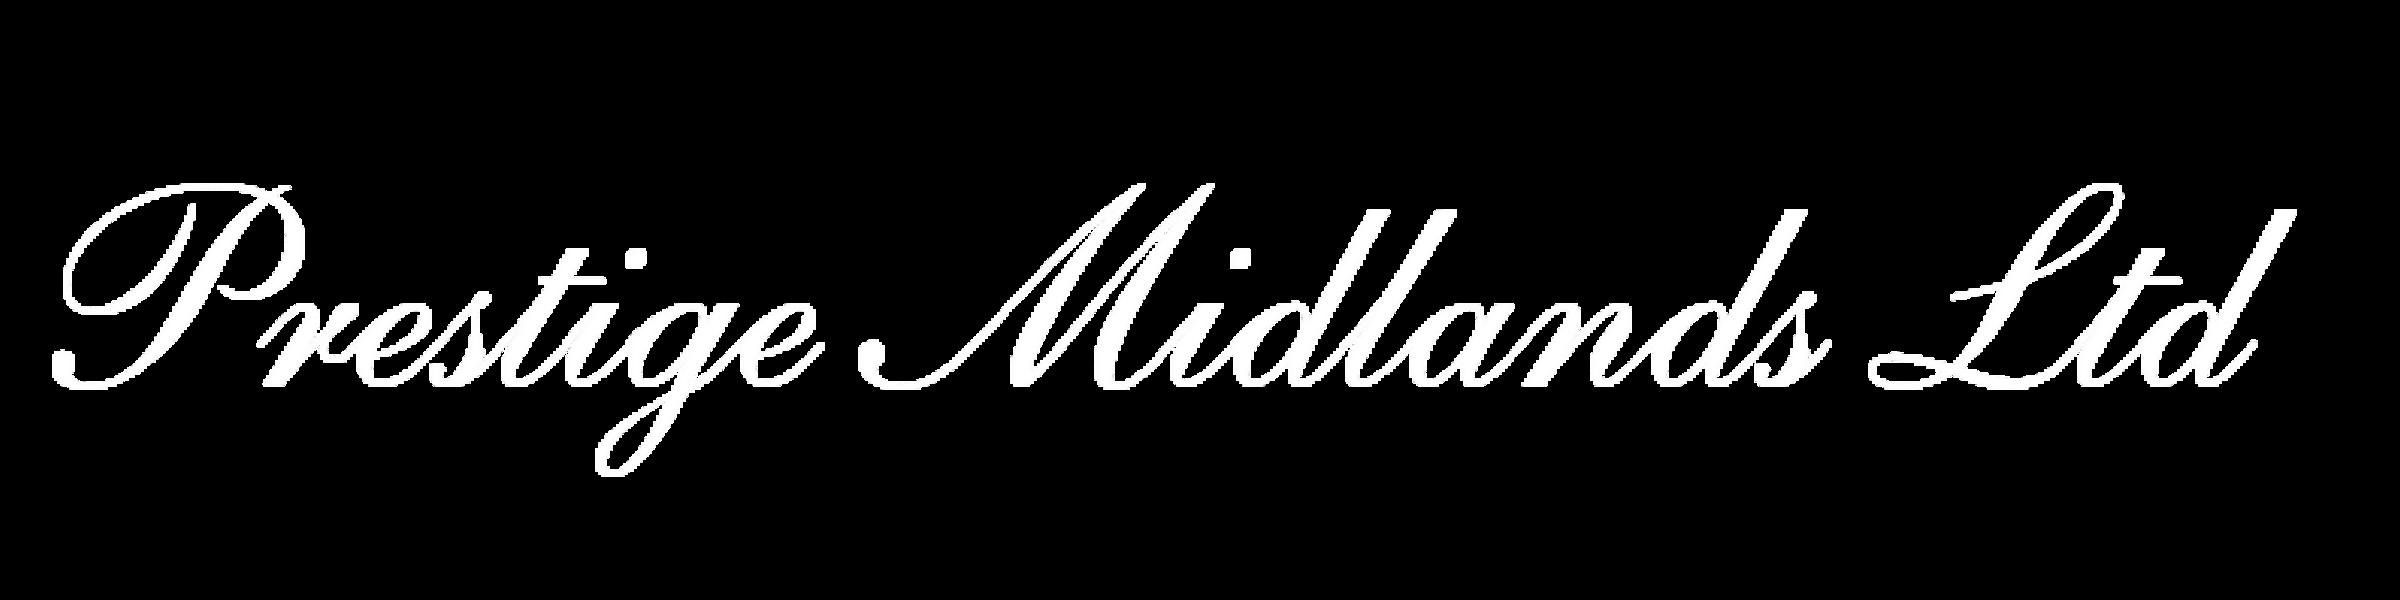 Prestige Midlands LTD